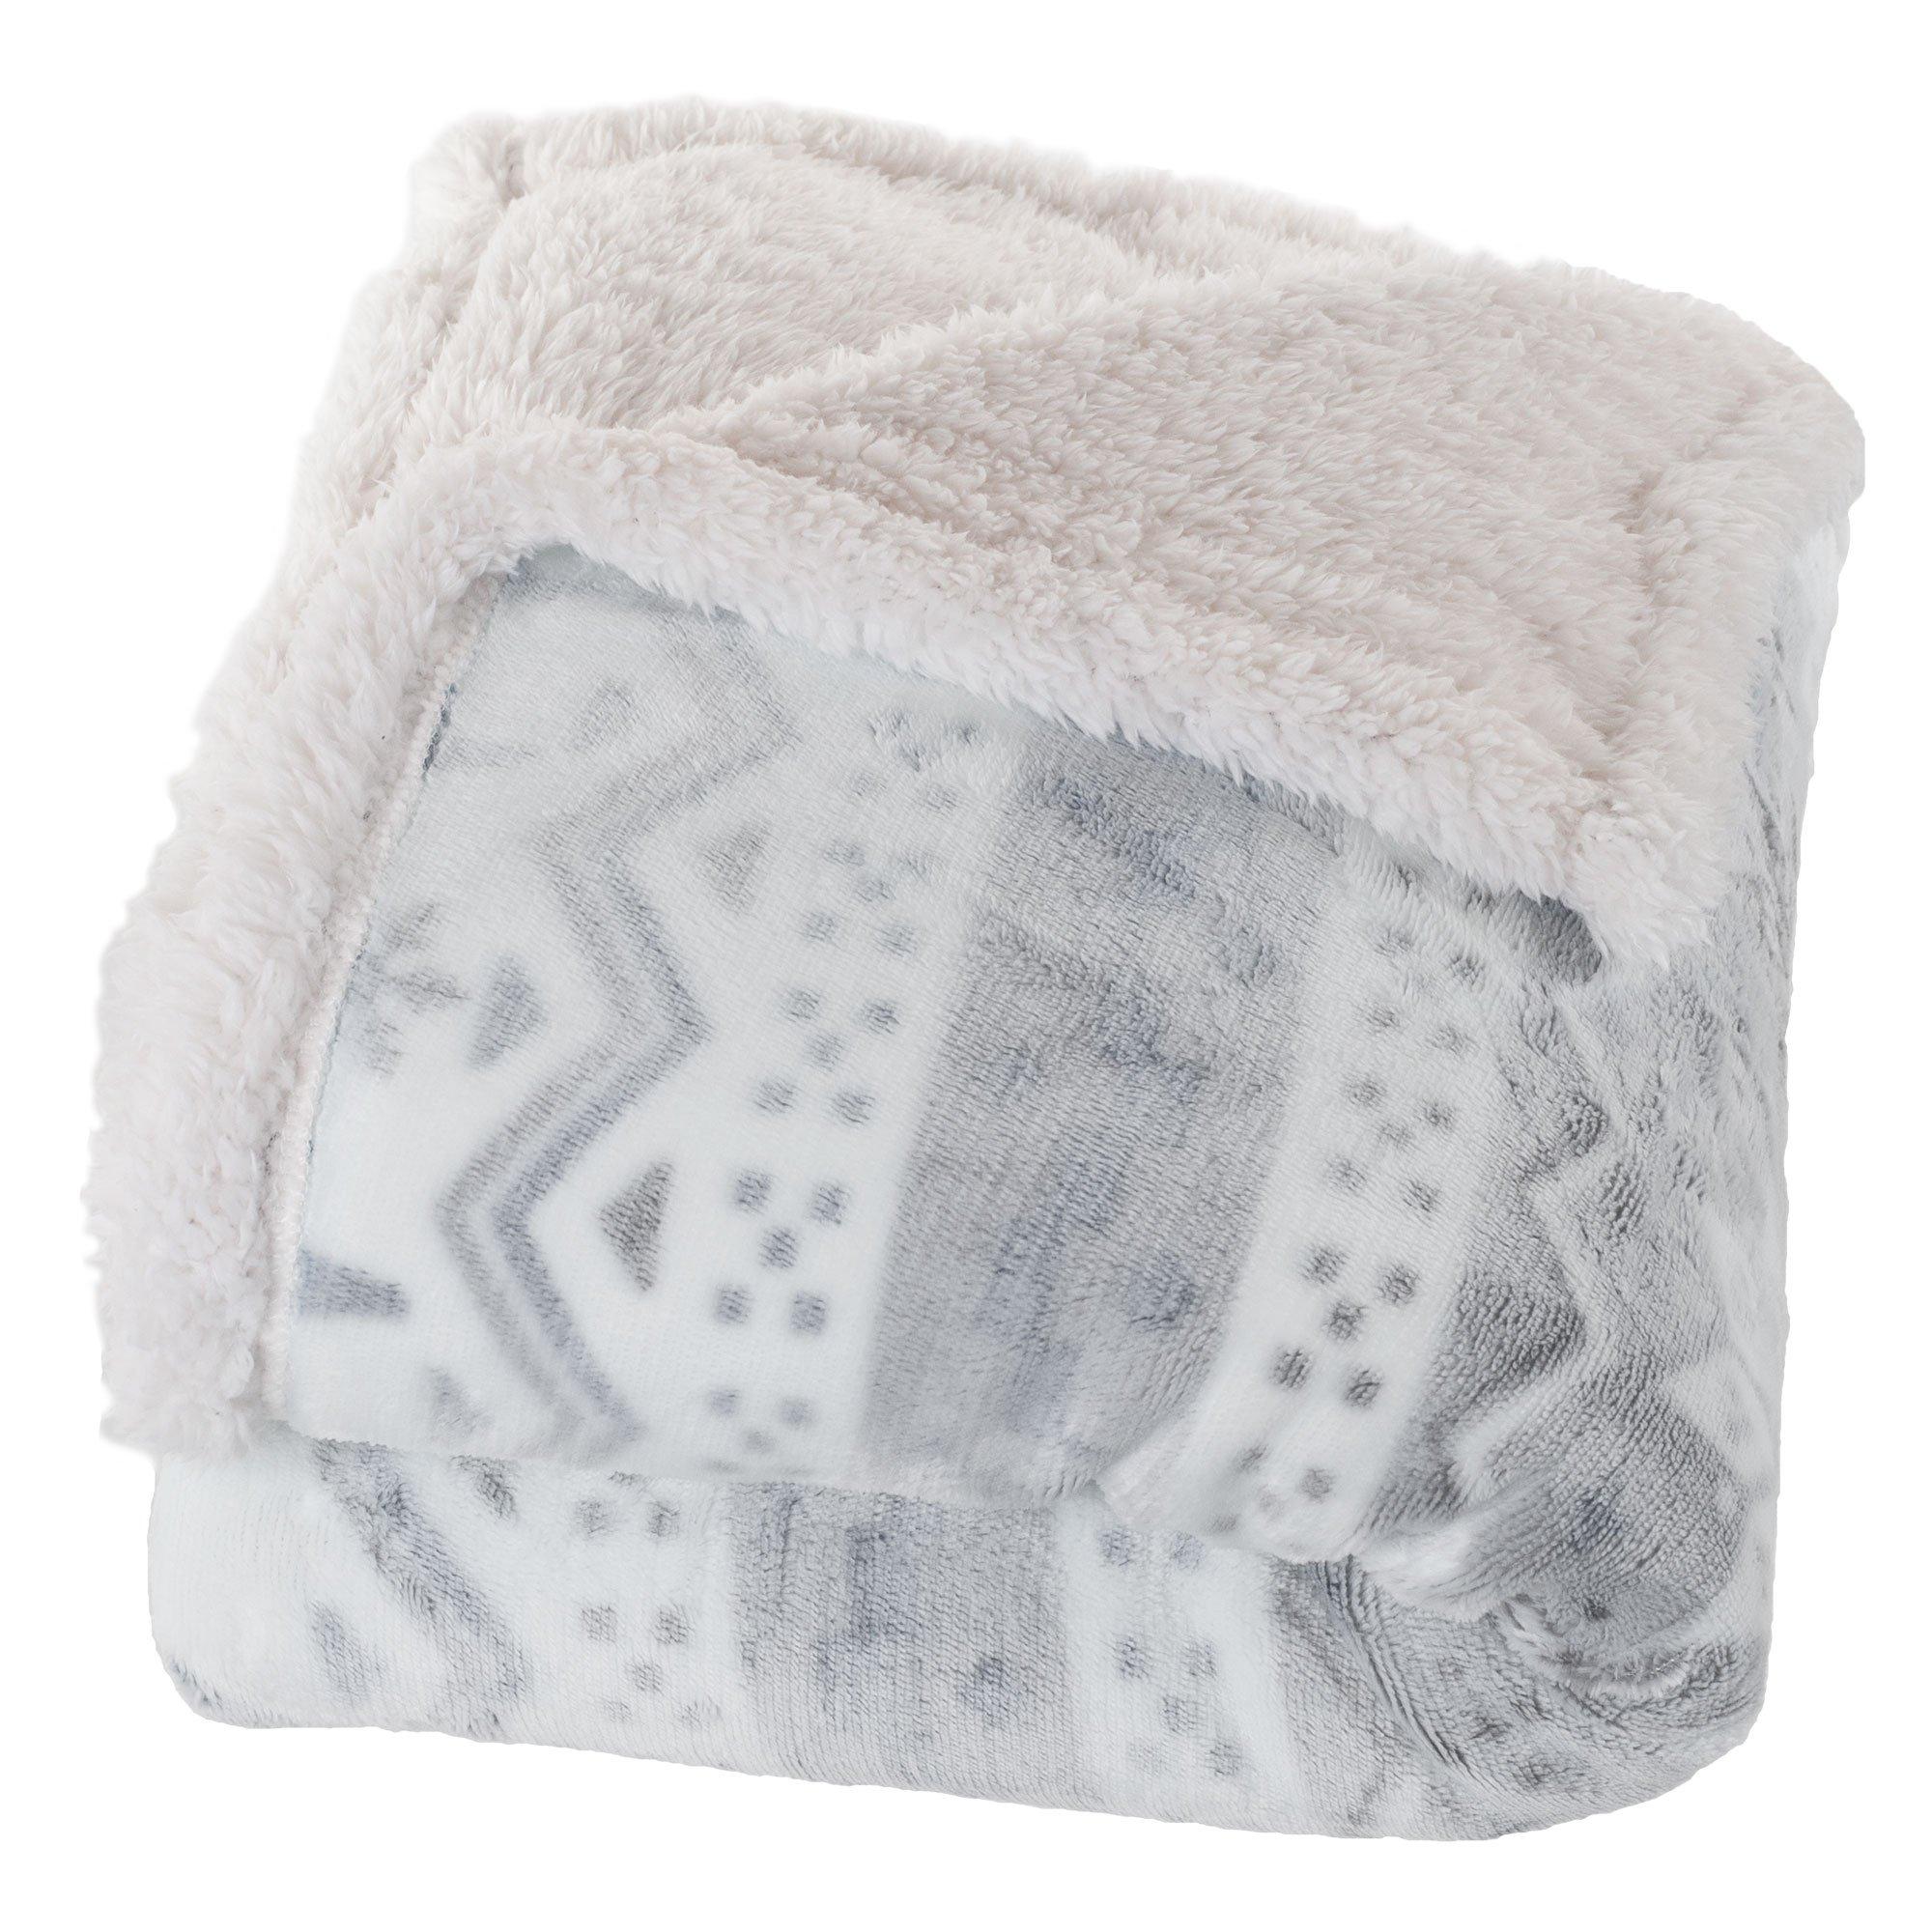 Bedford Home Fleece Sherpa Blanket Throw Blanket, Snow